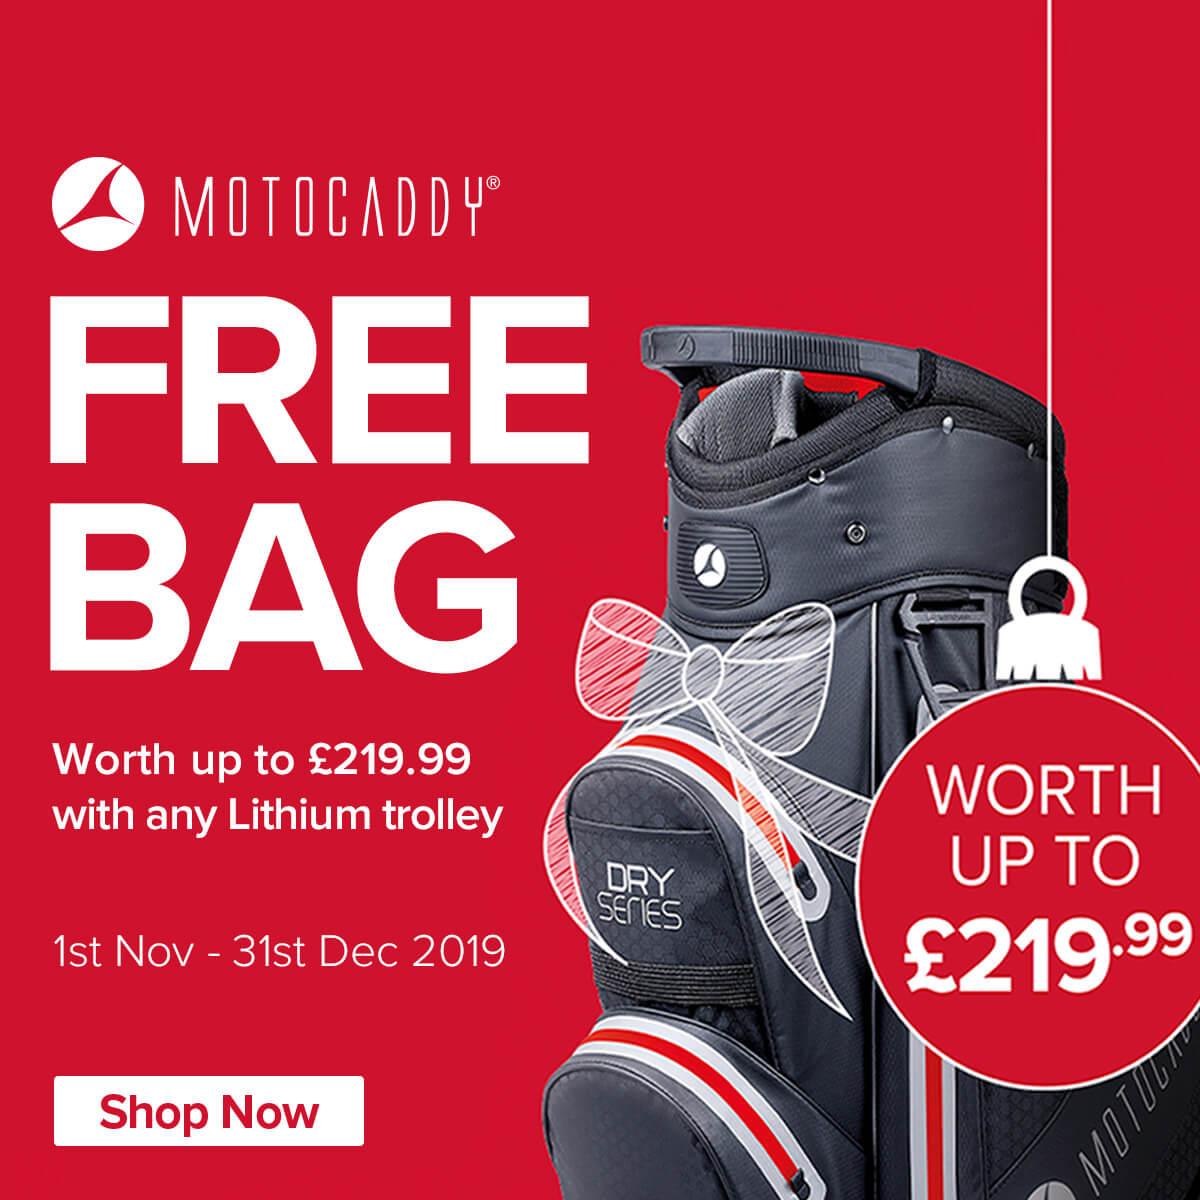 Motocaddy Free Bag Promotion